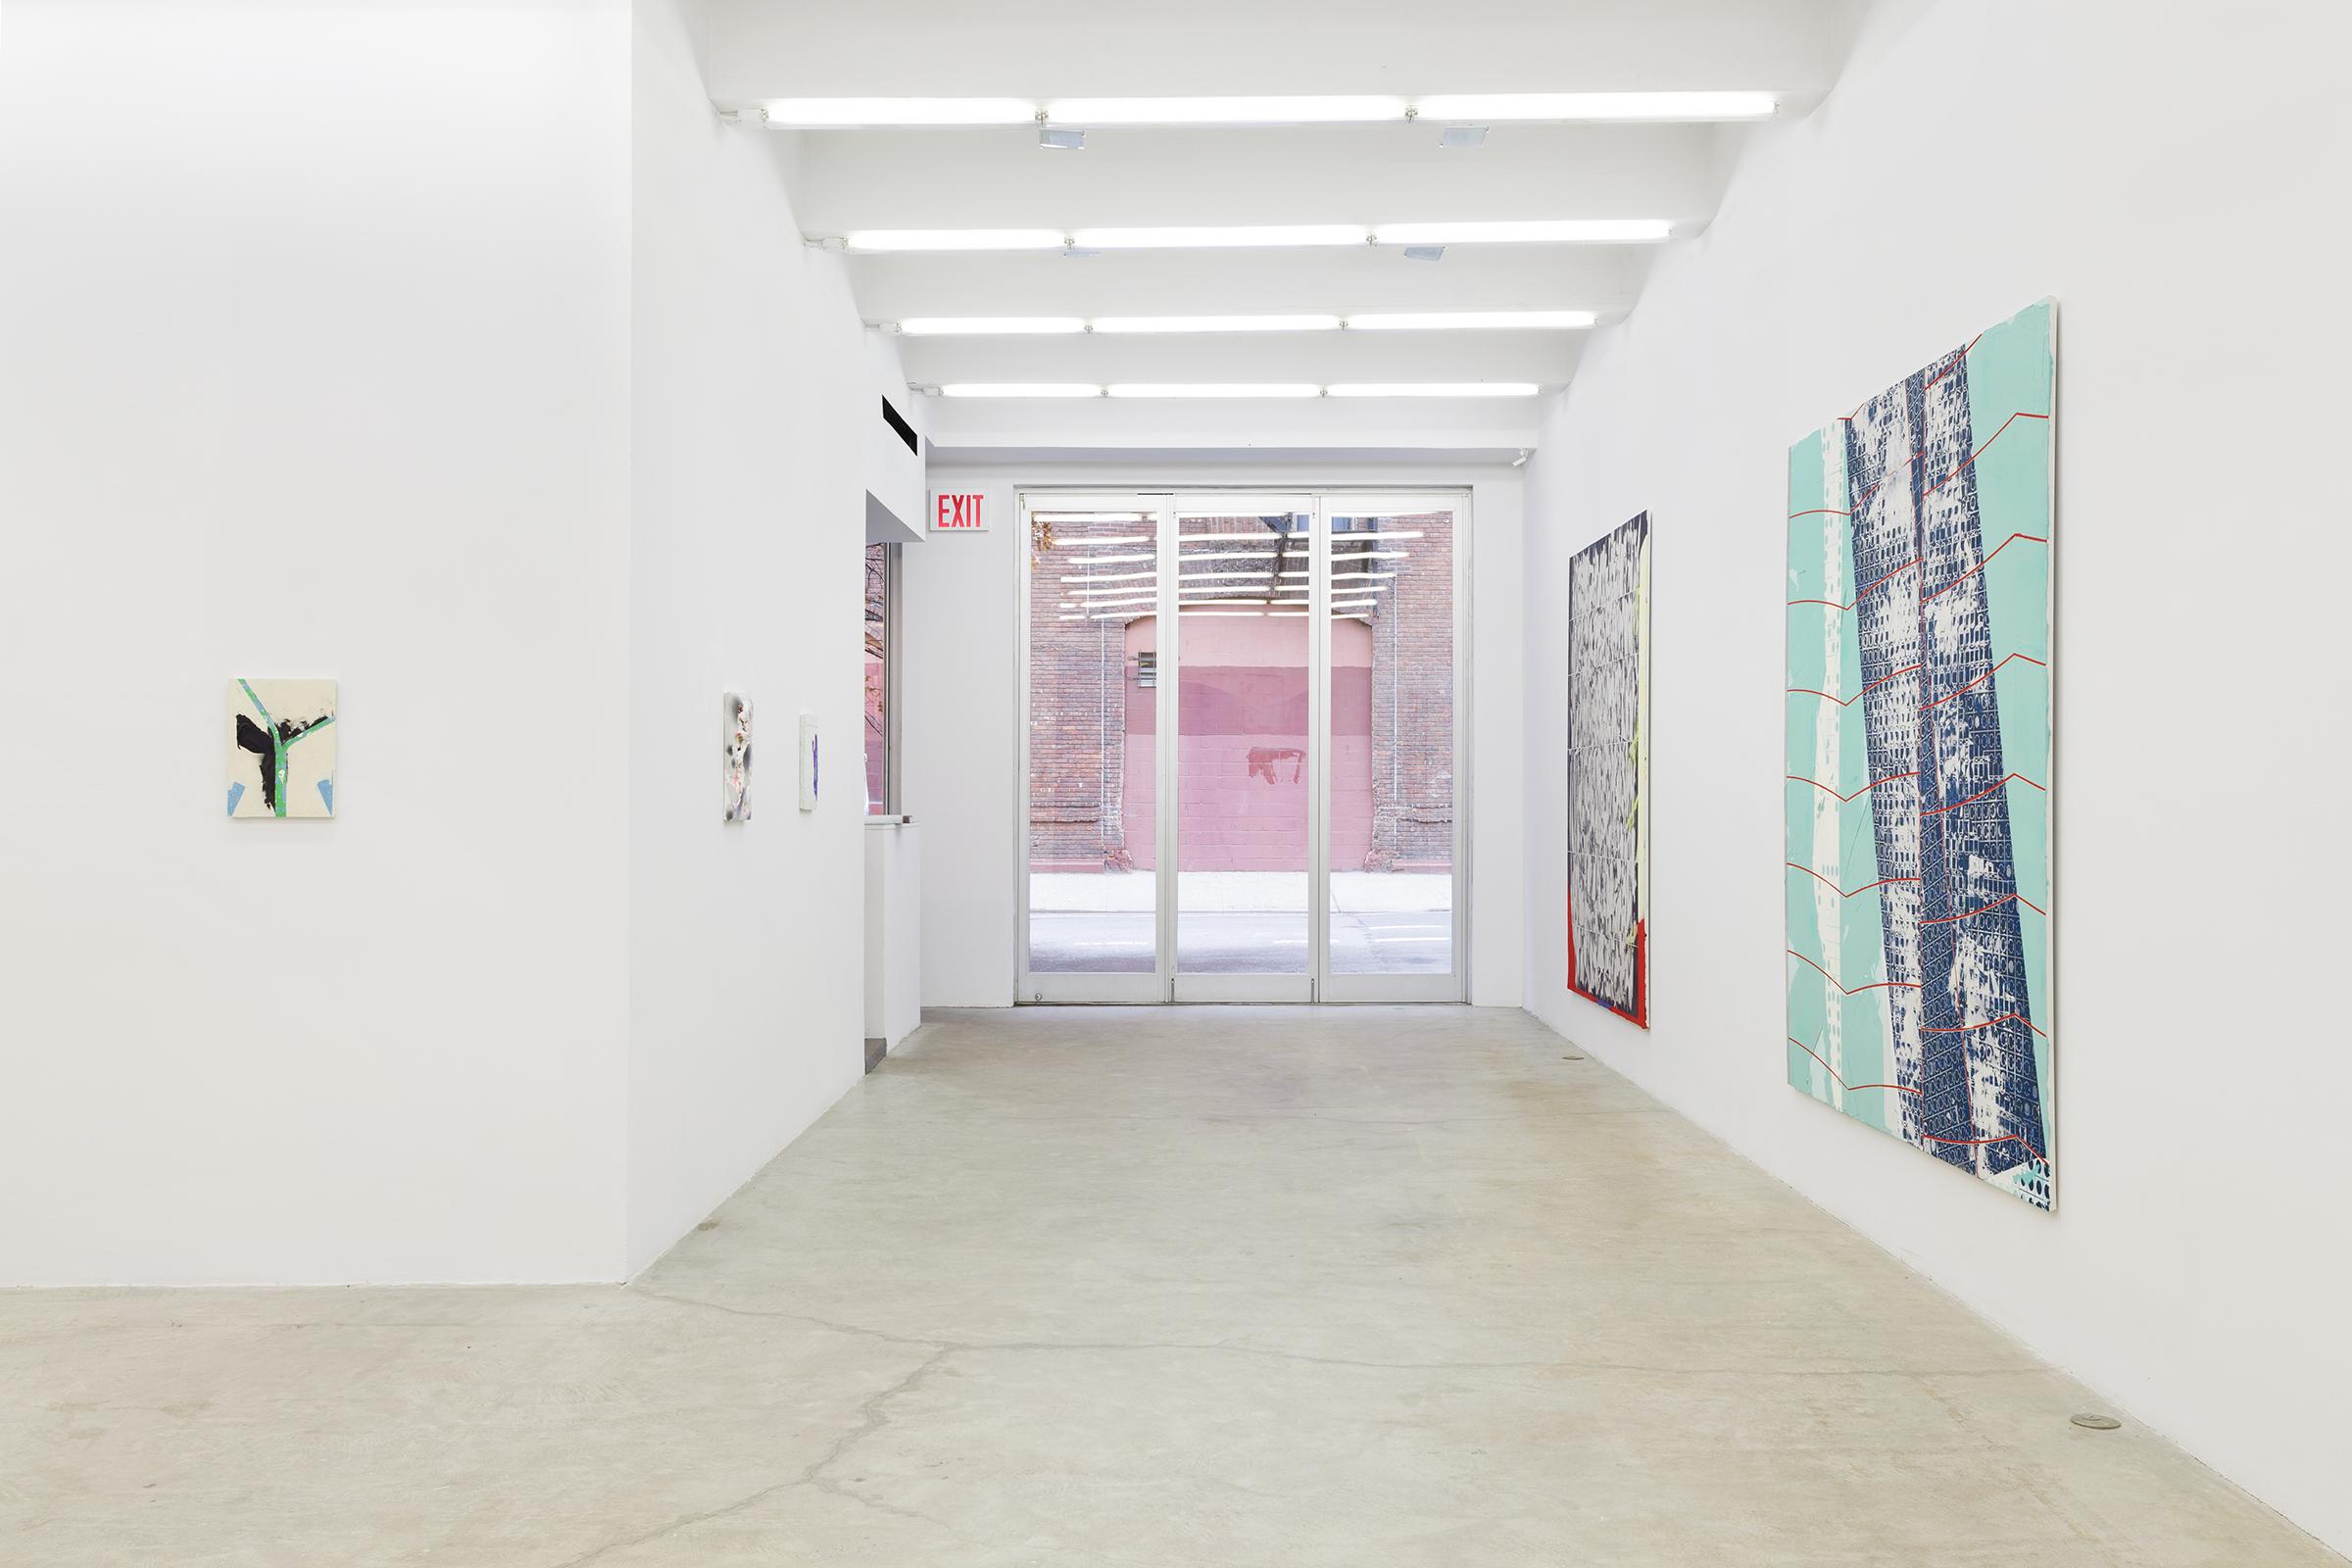 Installation view, Thick Pink, Stuffed Light, Martos Gallery, New York, 2014